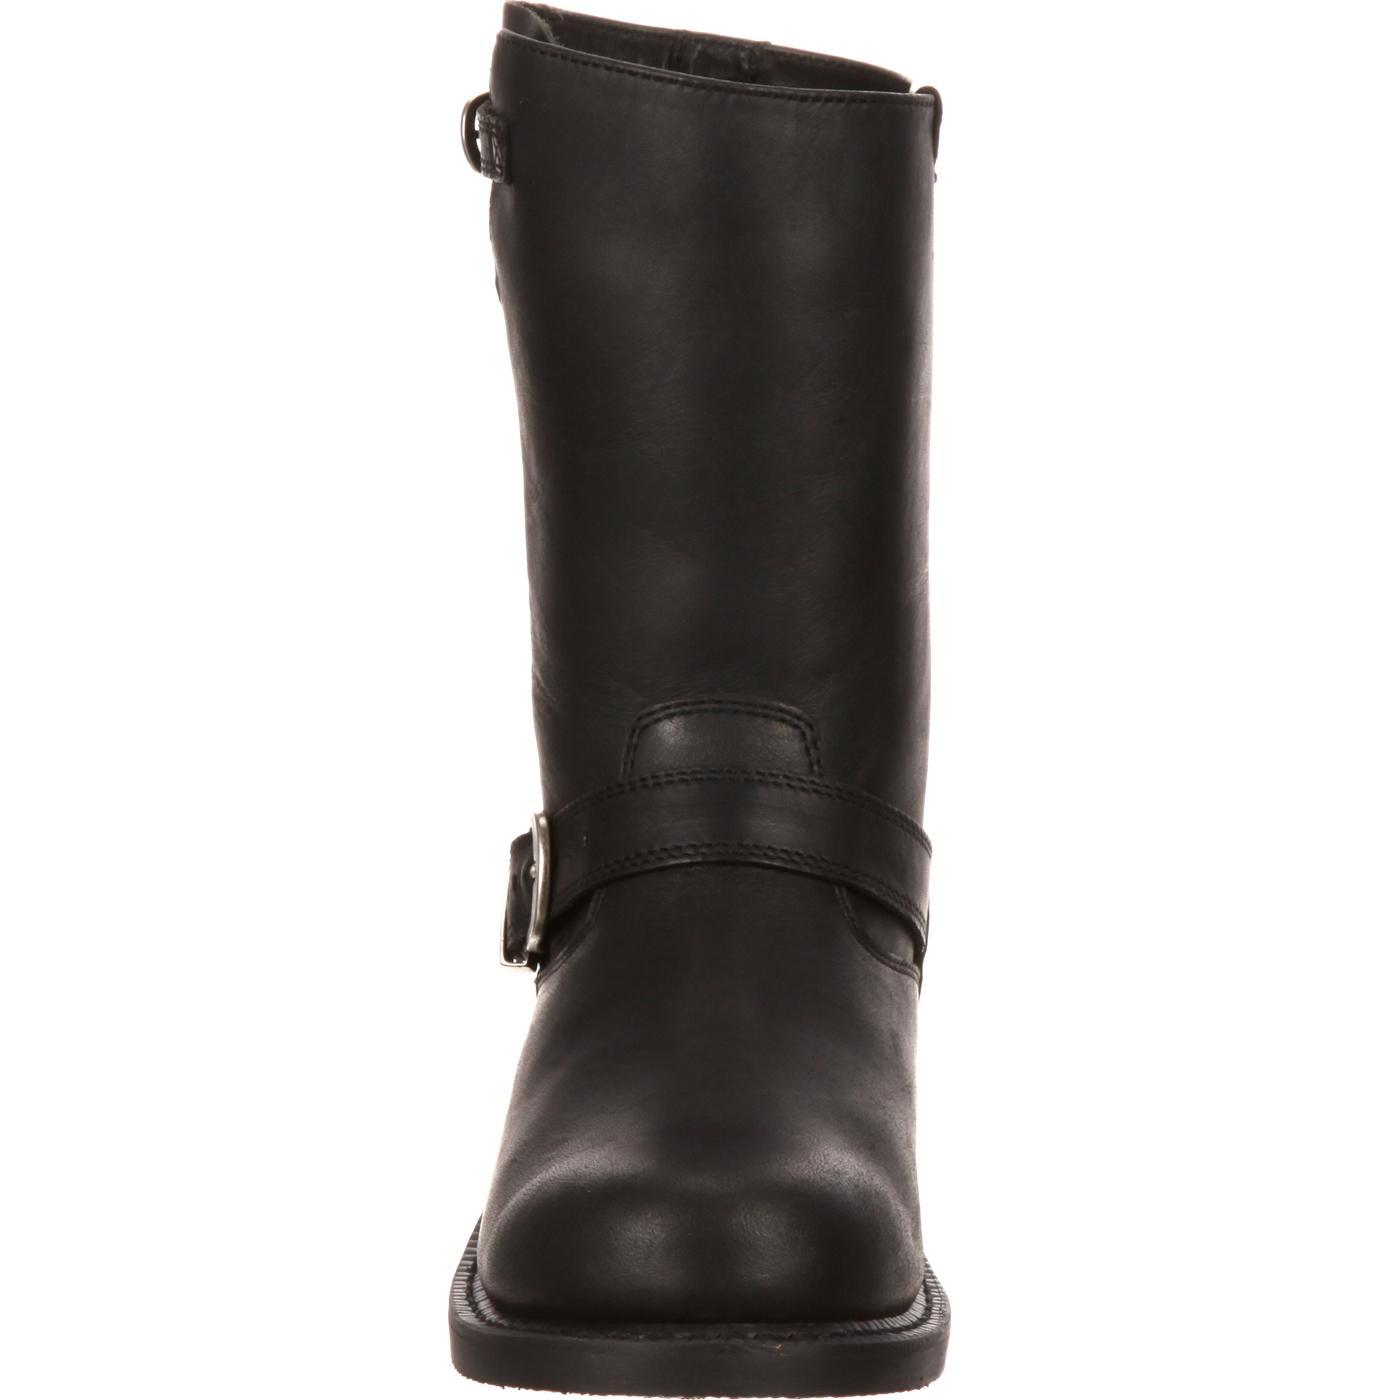 moto boots women s. images. durango city women\u0027s soho black engineer boot moto boots women s ,